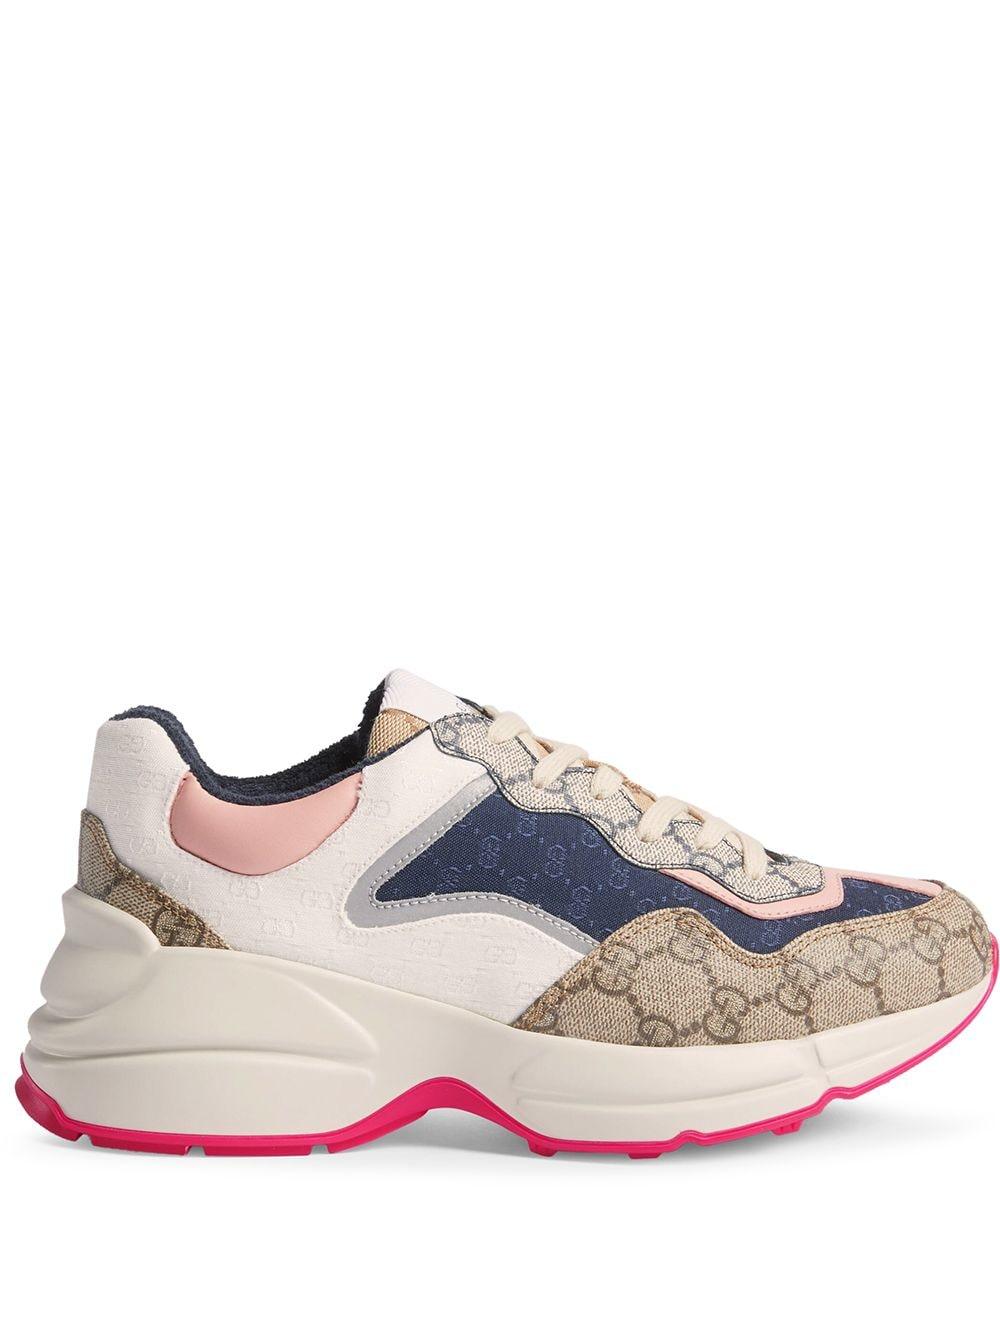 Rhyton Gg Sneakers